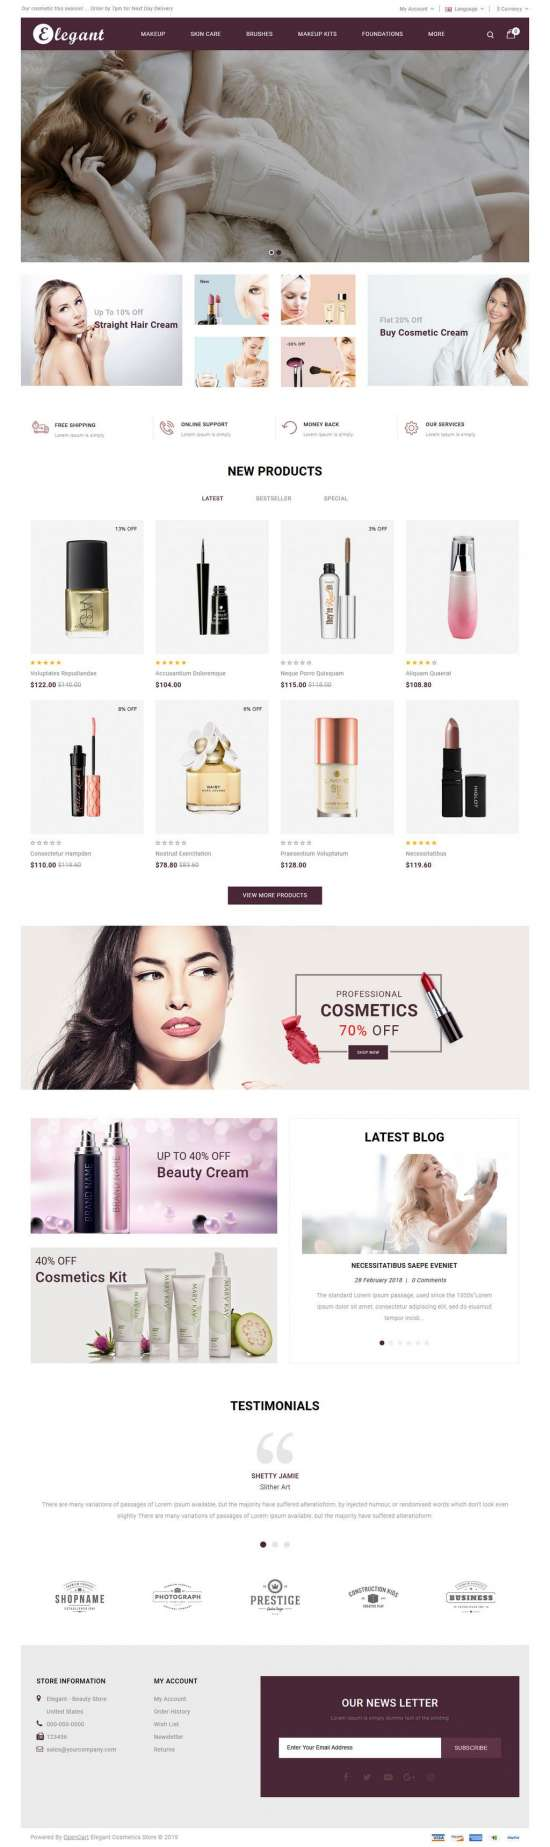 elegant cosmetic opencart theme 01 550x1847 - Elegant Cosmetic Opencart Theme